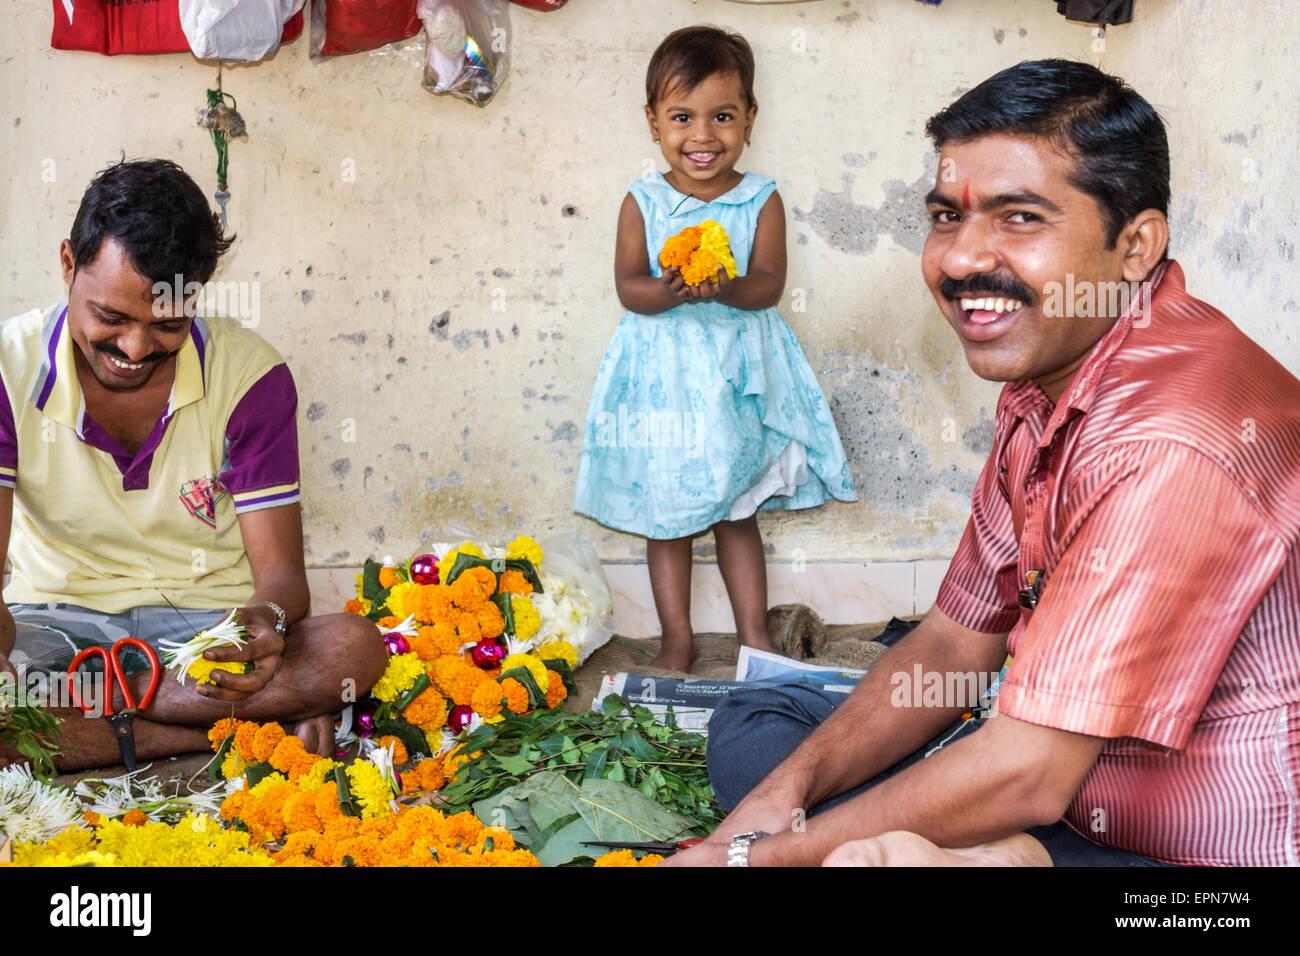 Mumbai India Asian Apollo Bandar Colaba Causeway Market Lala Nigam Road shopping street vendors flower flowers man - Stock Image